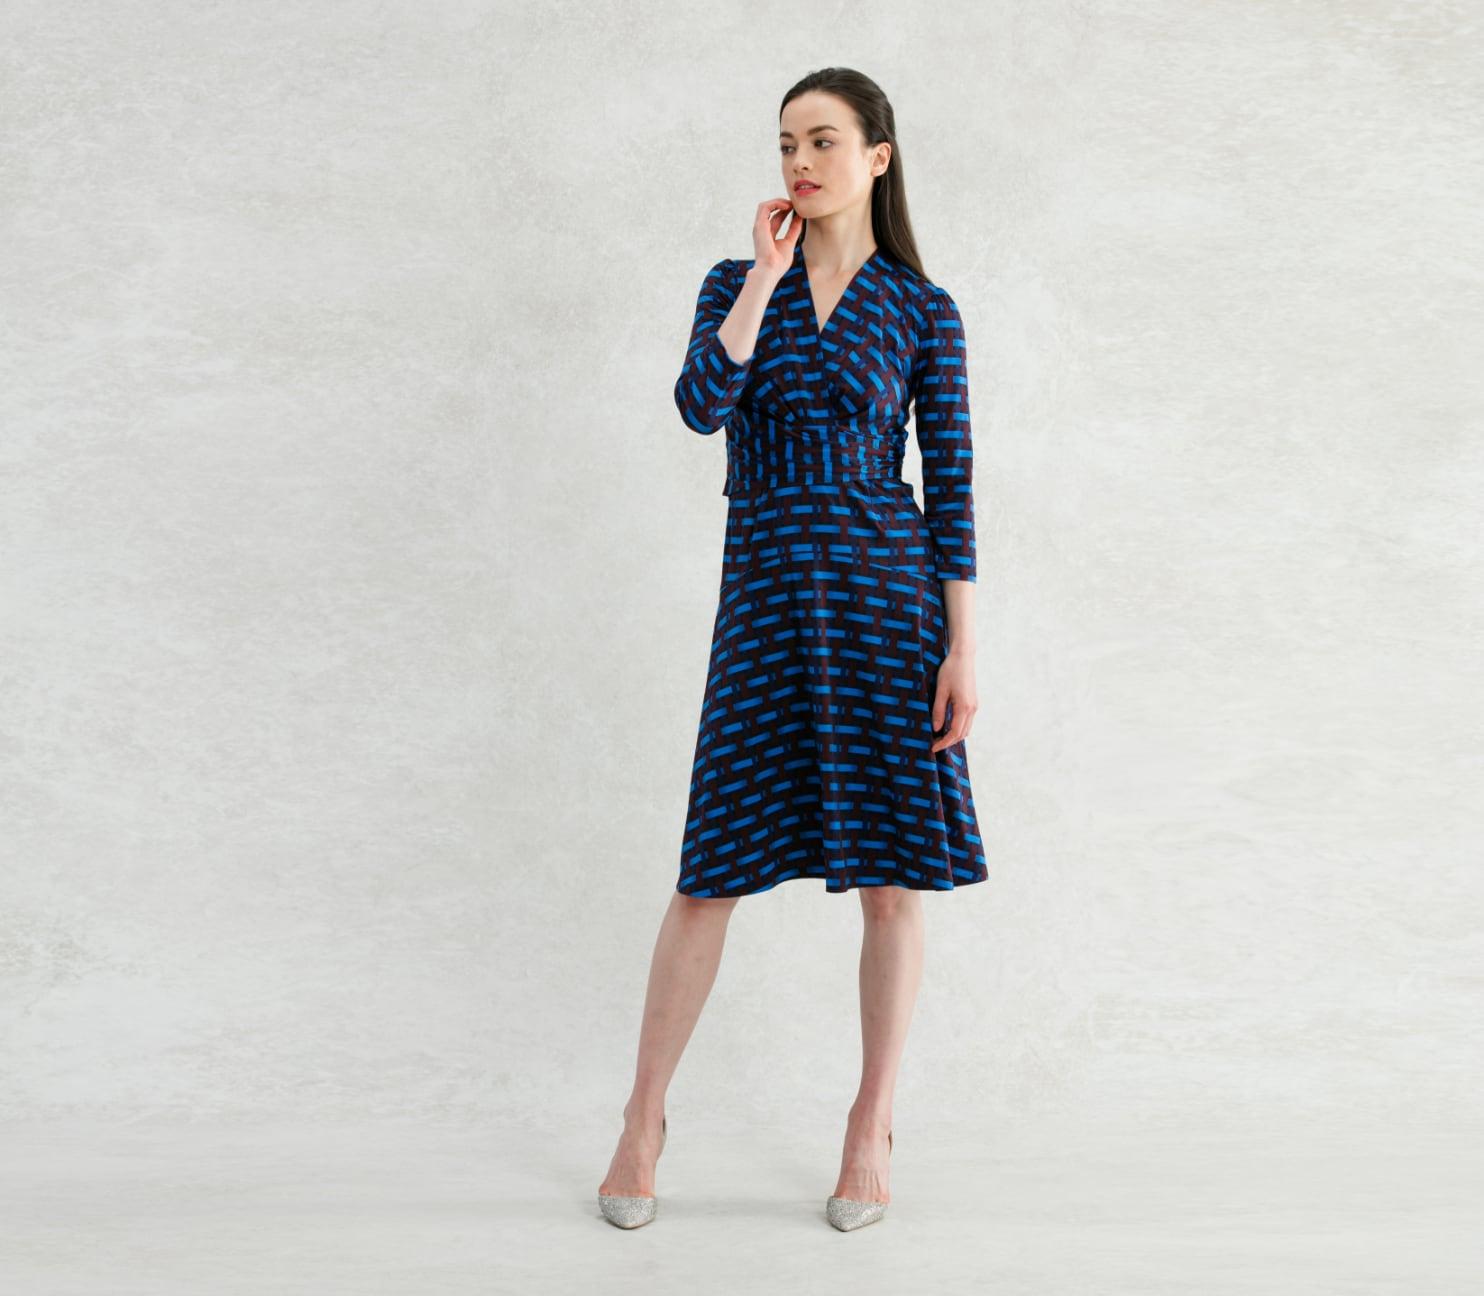 06_Thumbnail_Blue_Check_CacheCoeur_Dress.jpg